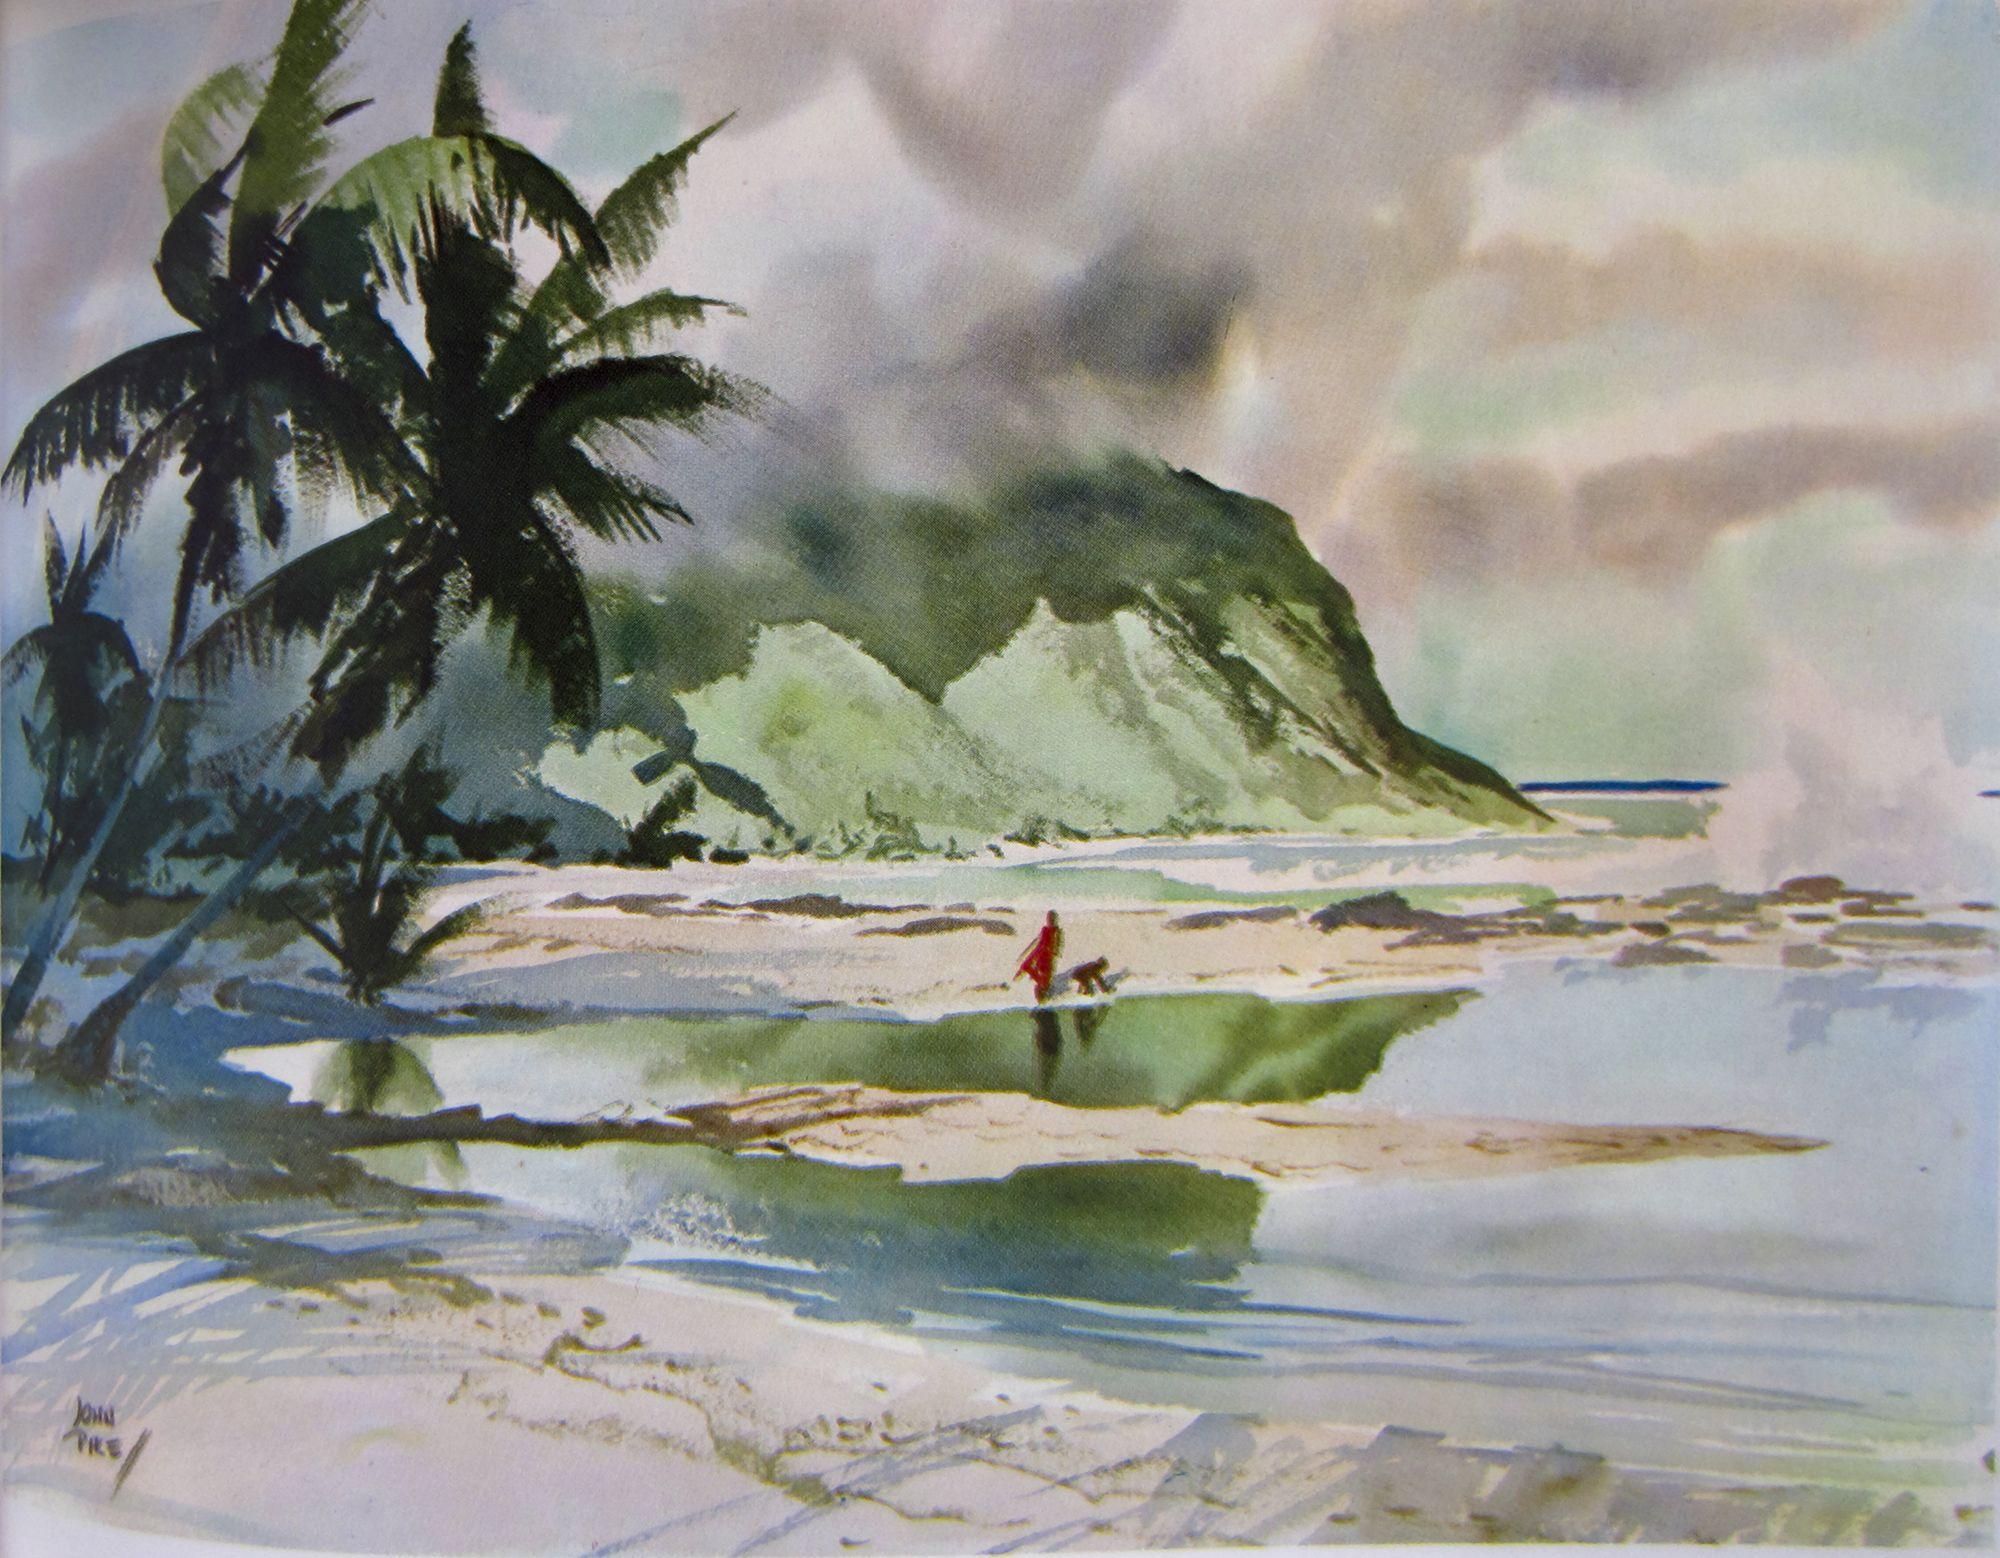 Watercolor artist magazine customer service - John Pike Watercolor